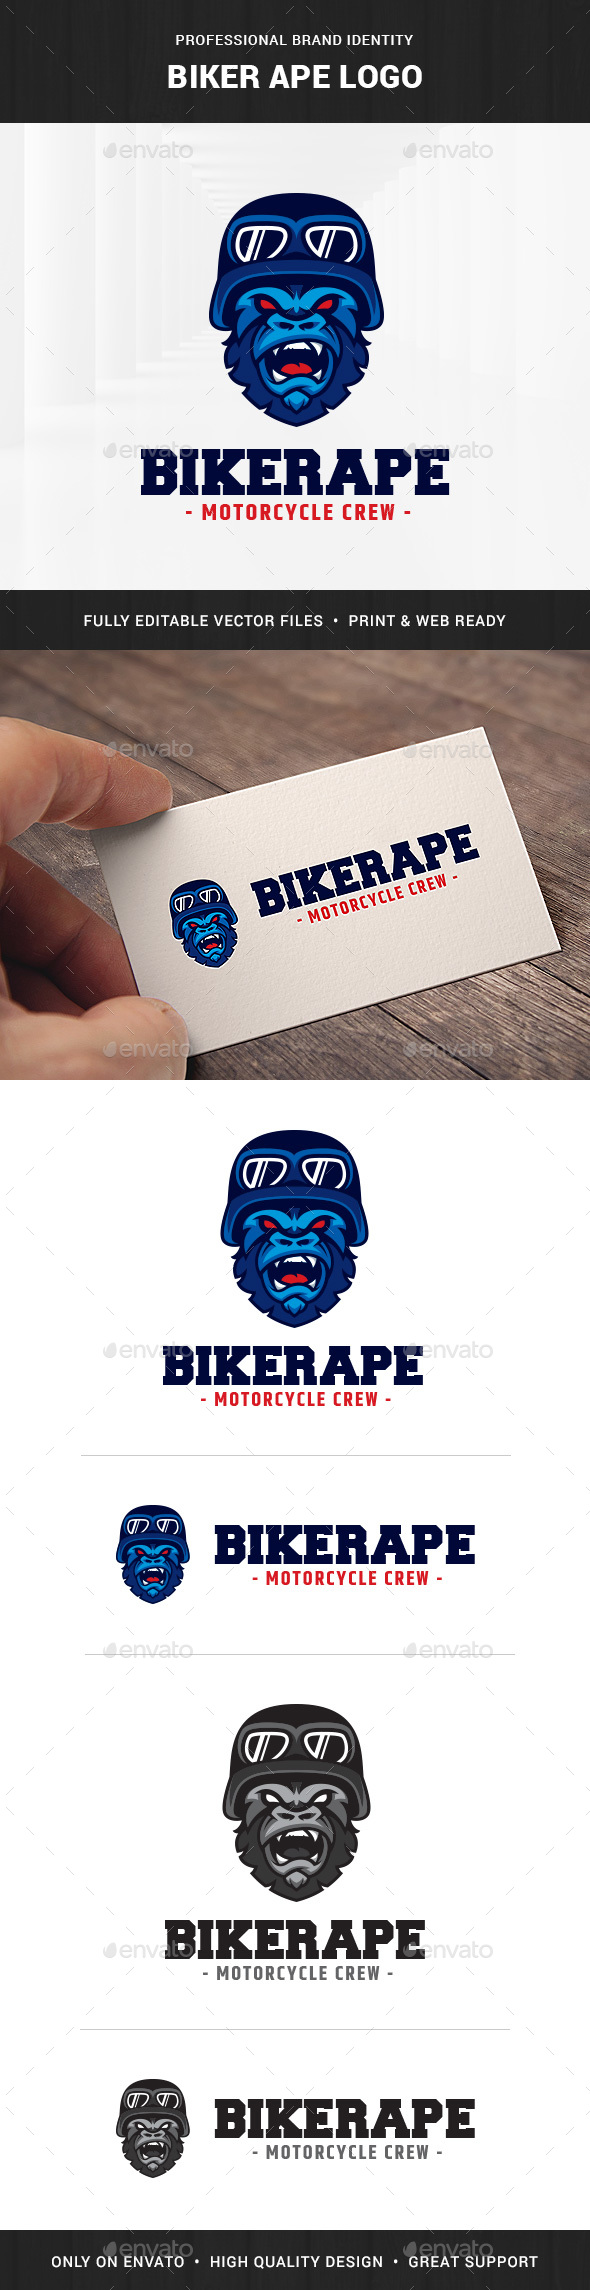 Biker Ape Logo Template